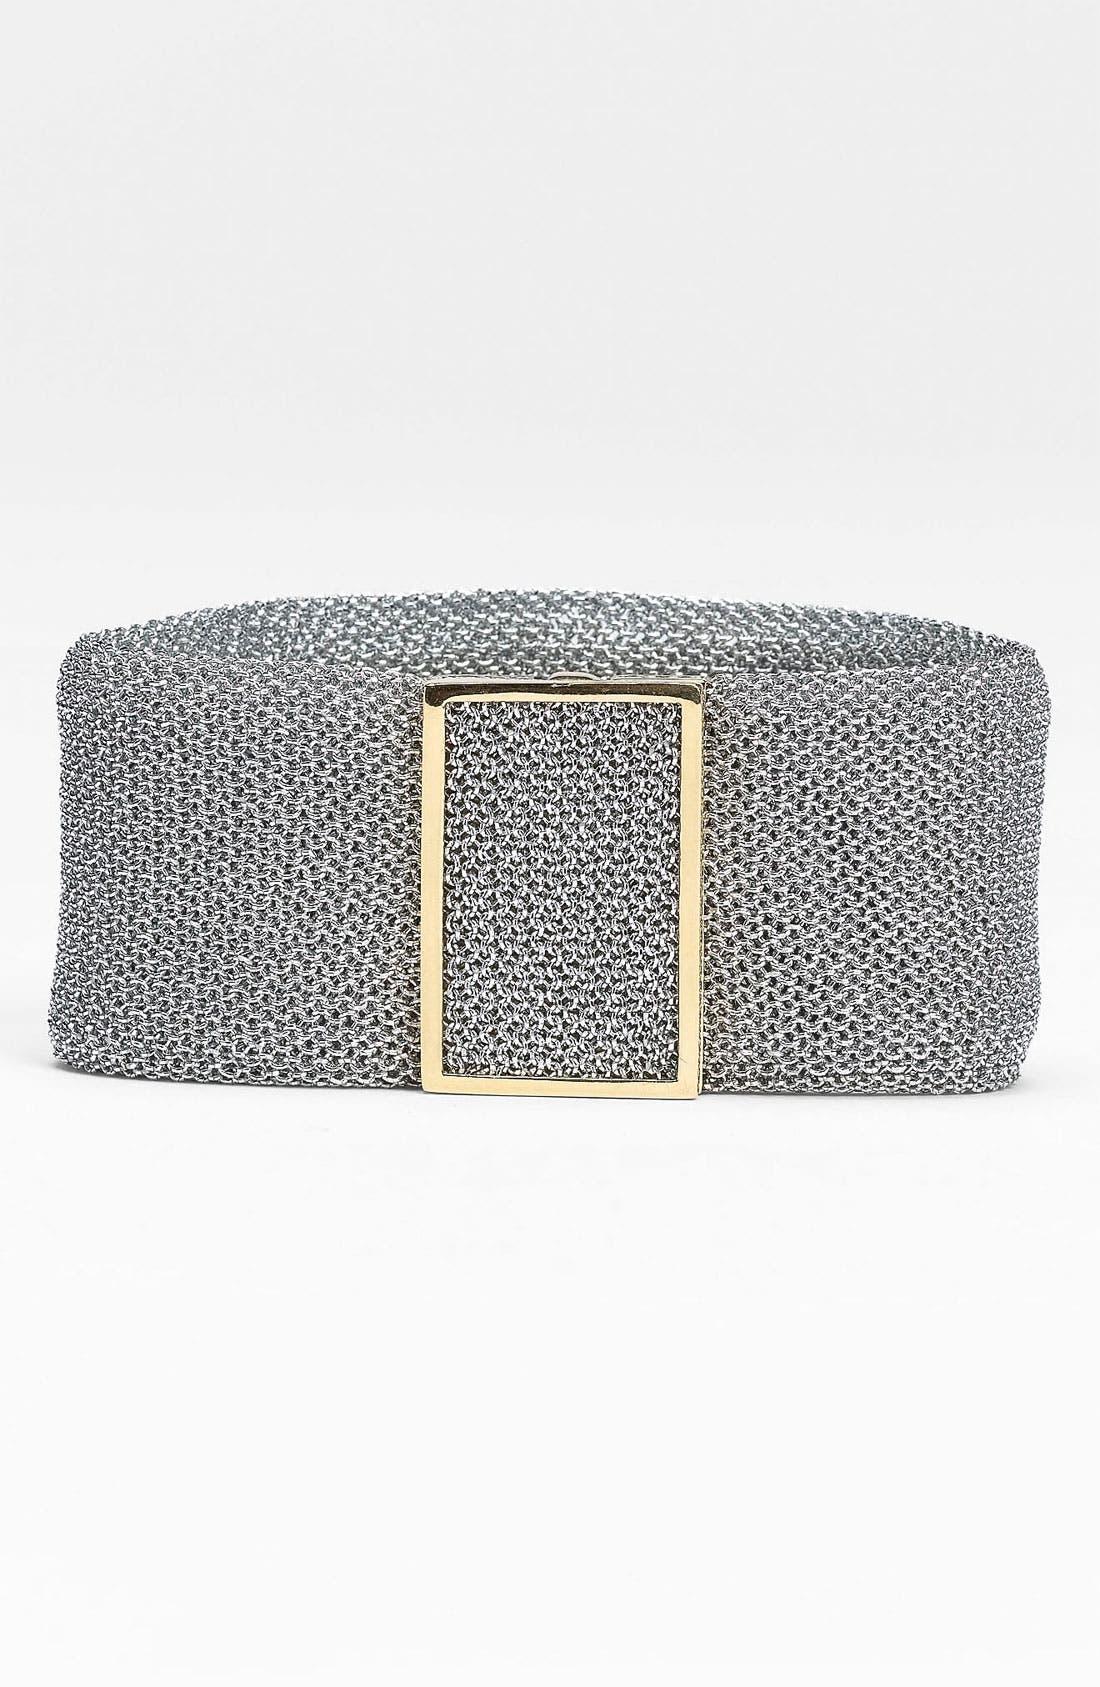 Alternate Image 1 Selected - Adami & Martucci 'Mesh' Bracelet (Nordstrom Exclusive)